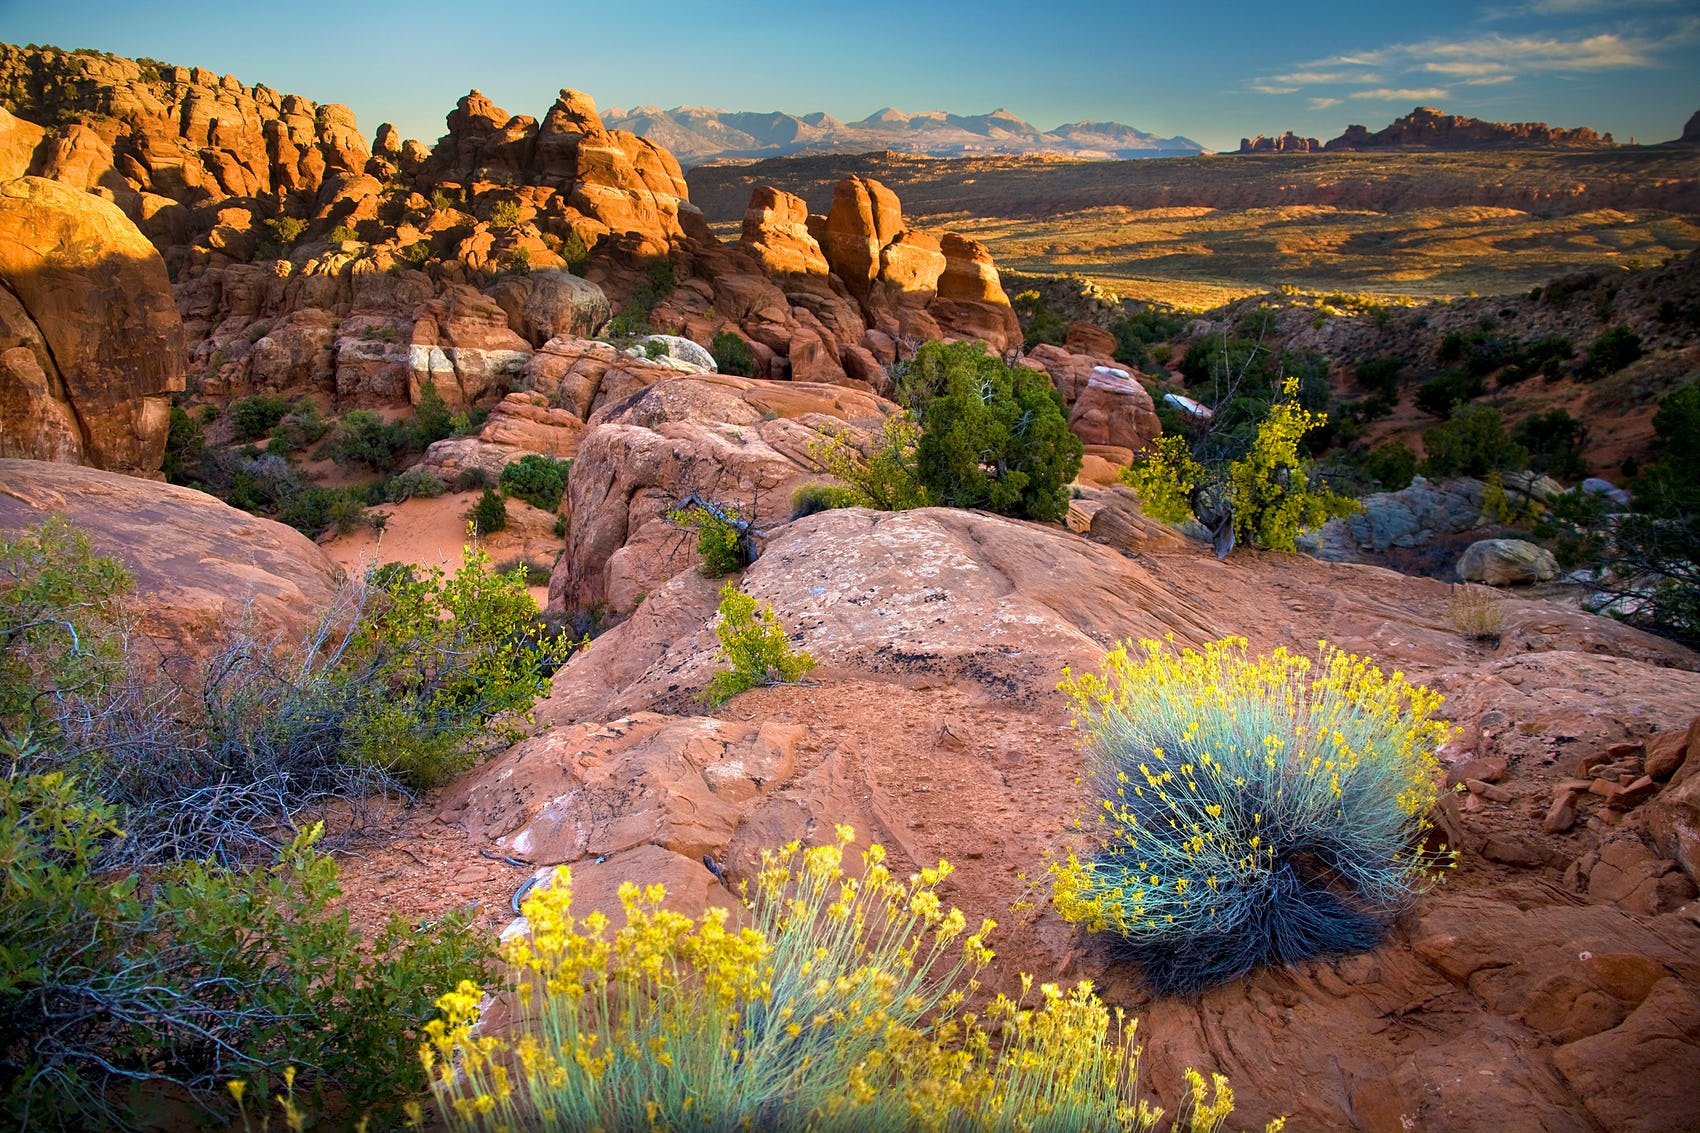 Het Utahraptor State Park in Utah, Peter Kunasz/Shutterstock